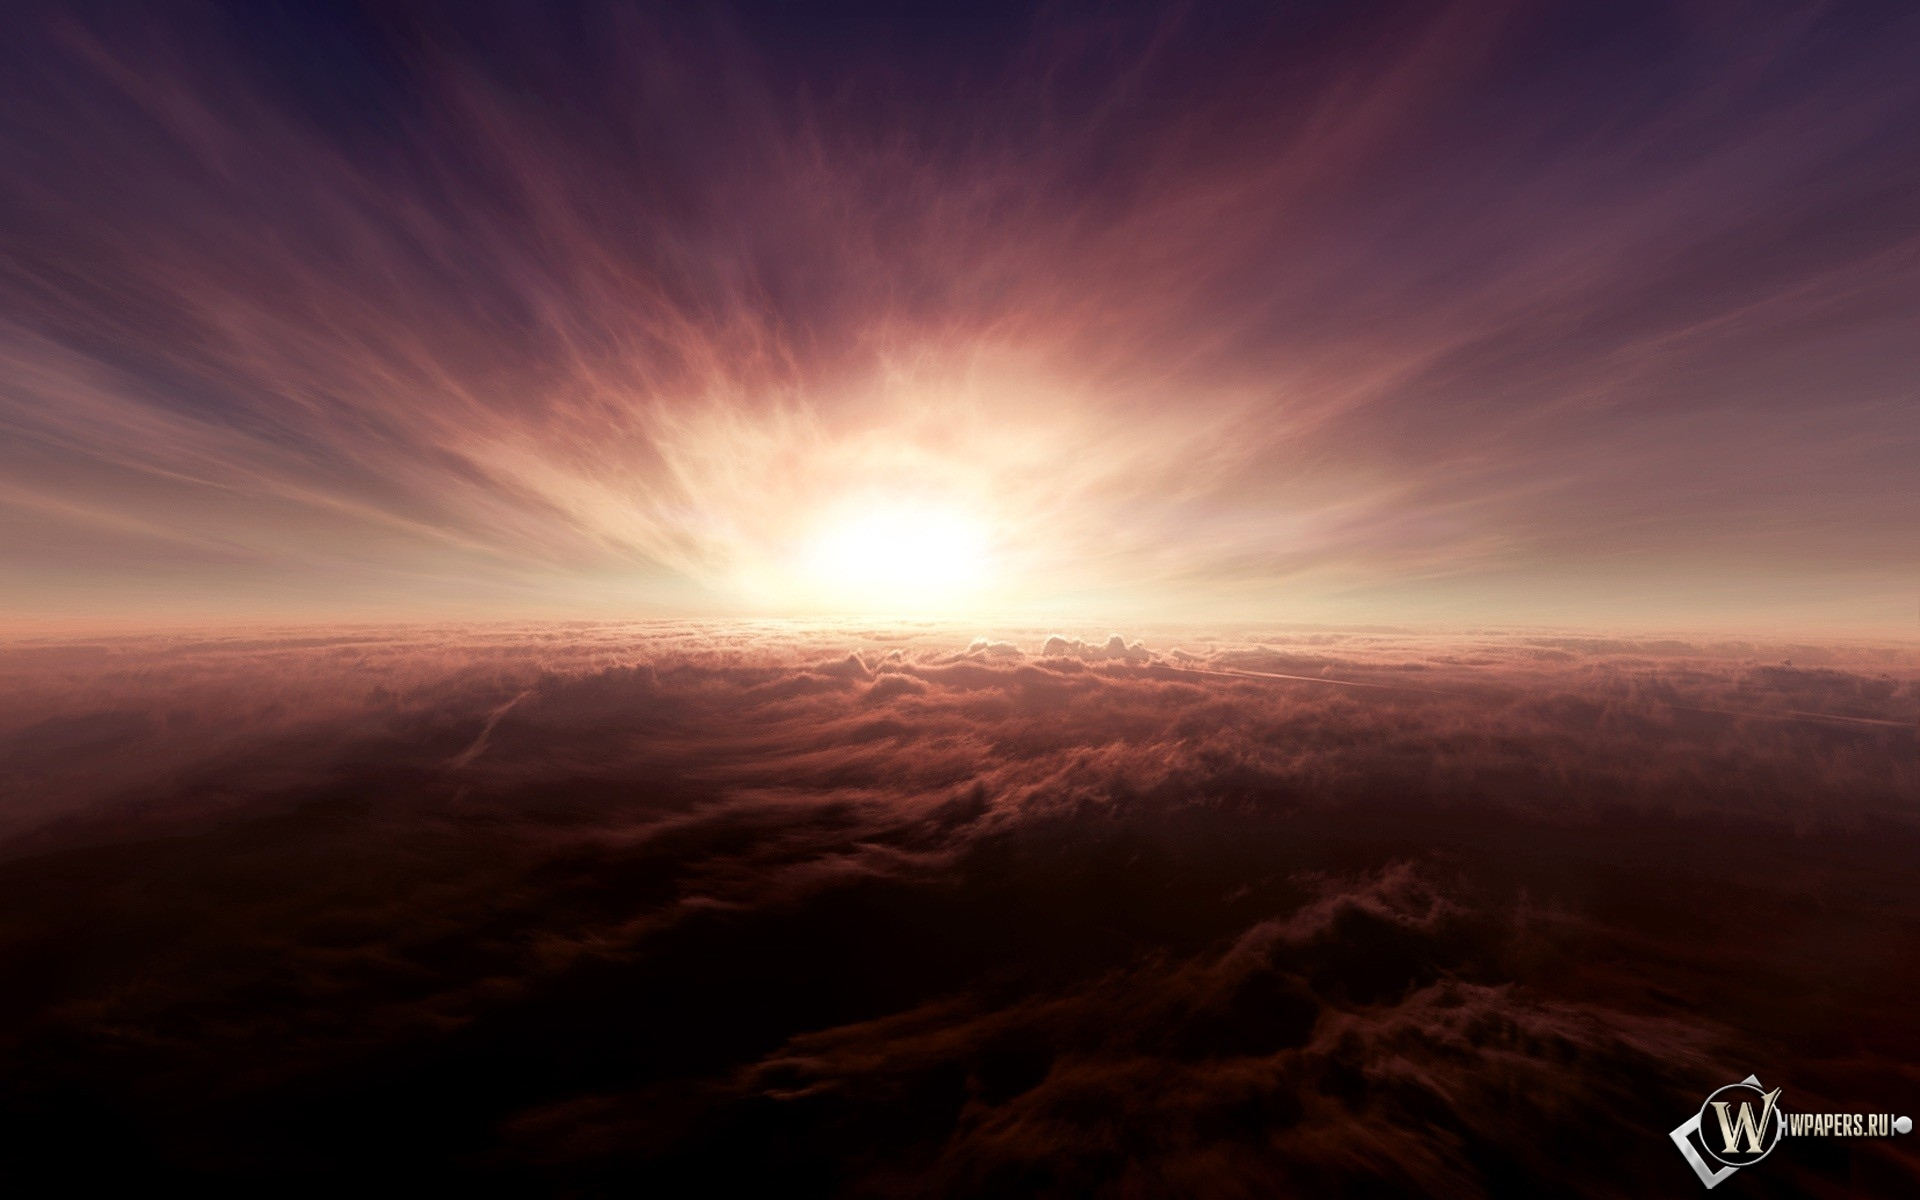 Закат солнца над облаками 1920x1200